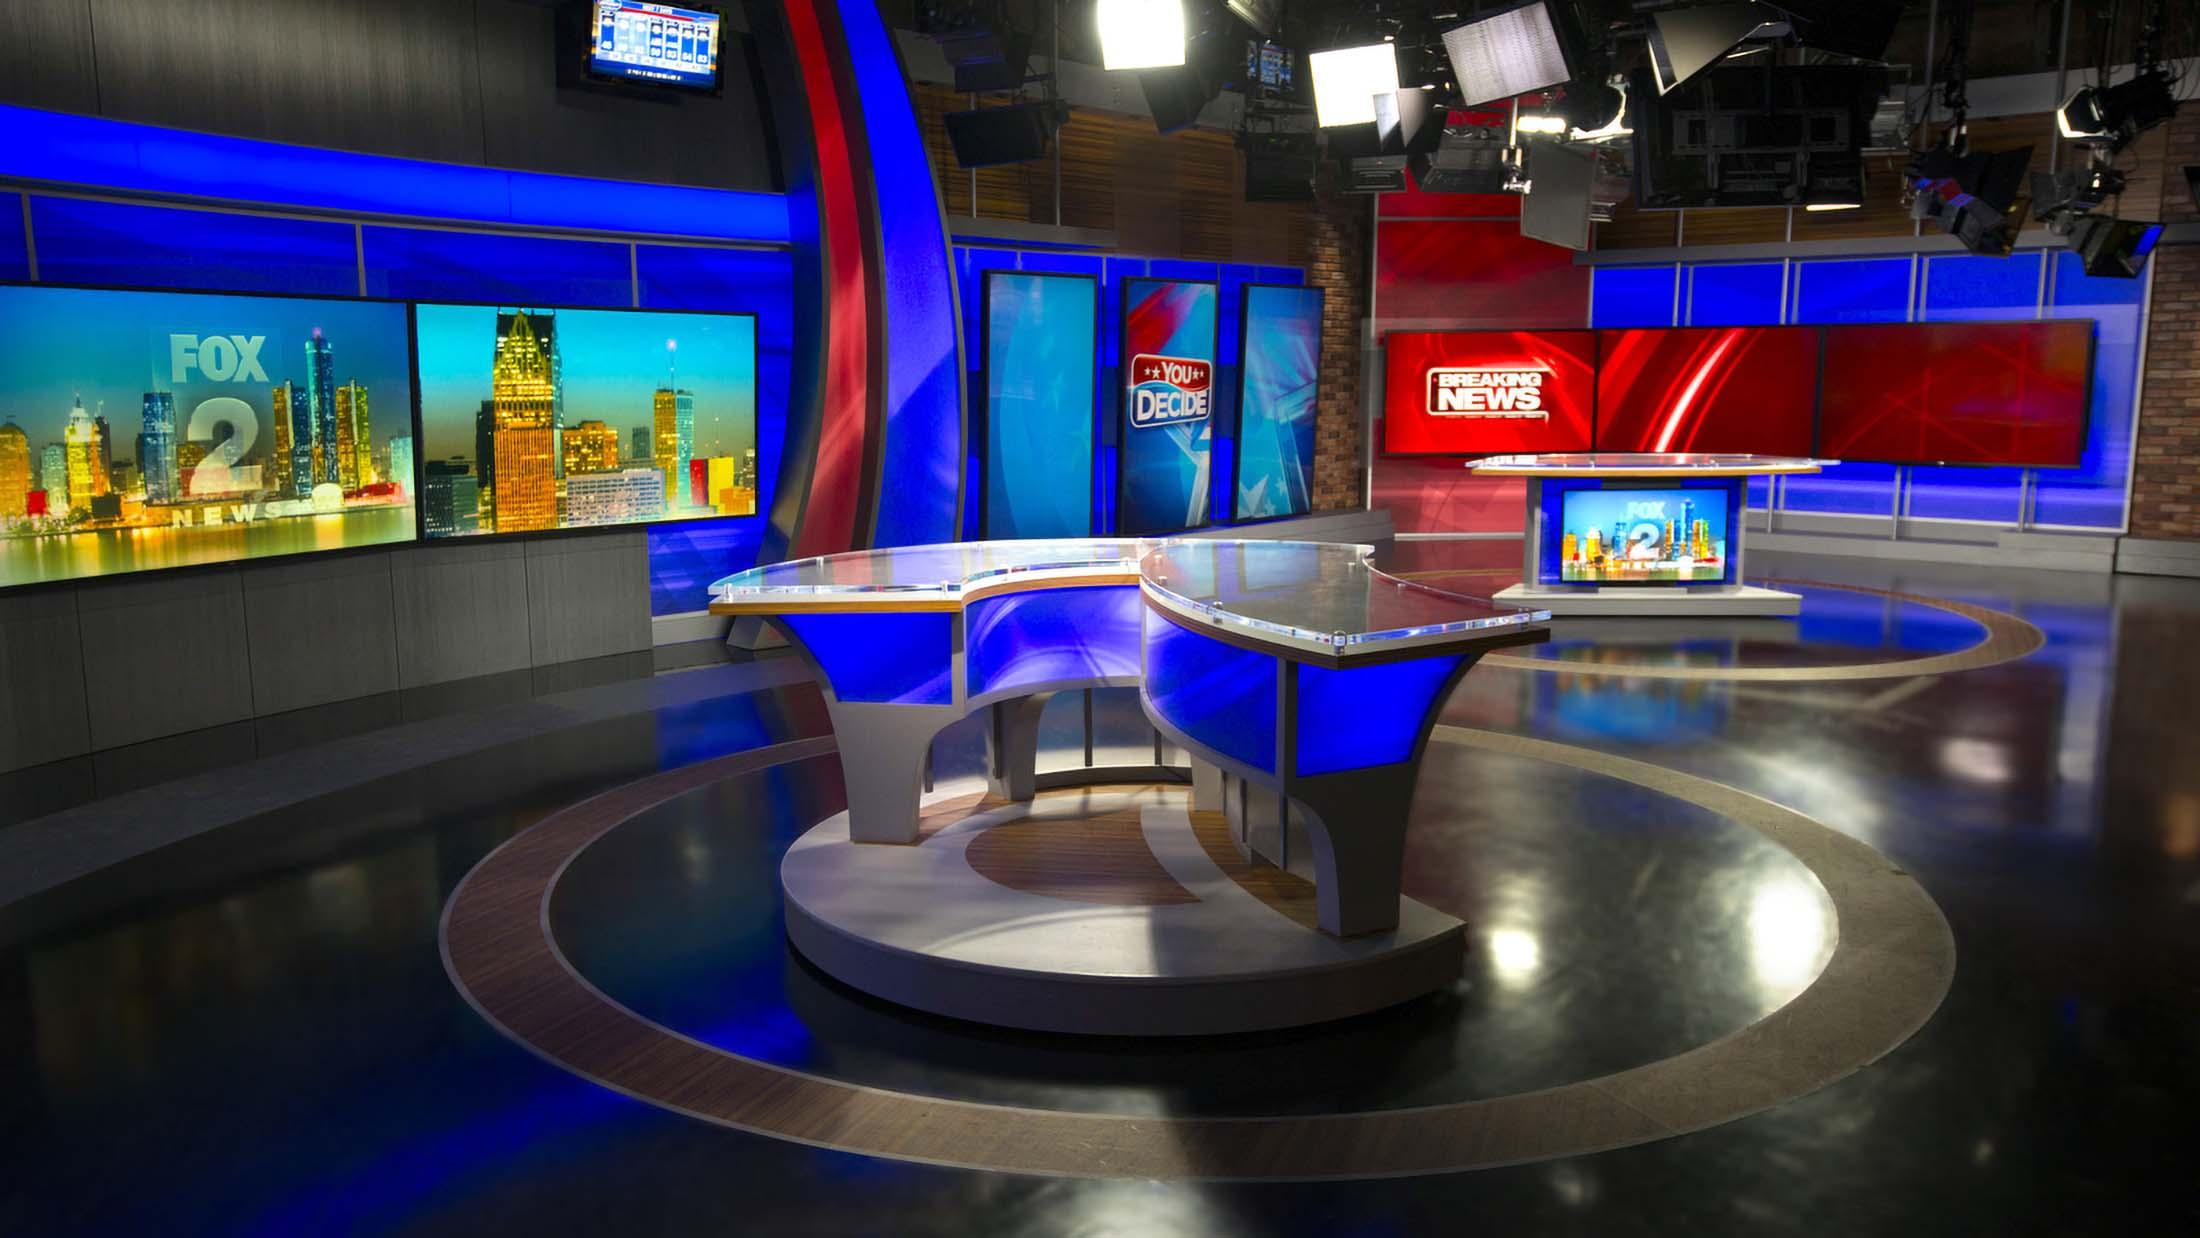 Fox 2 News Detroit studio